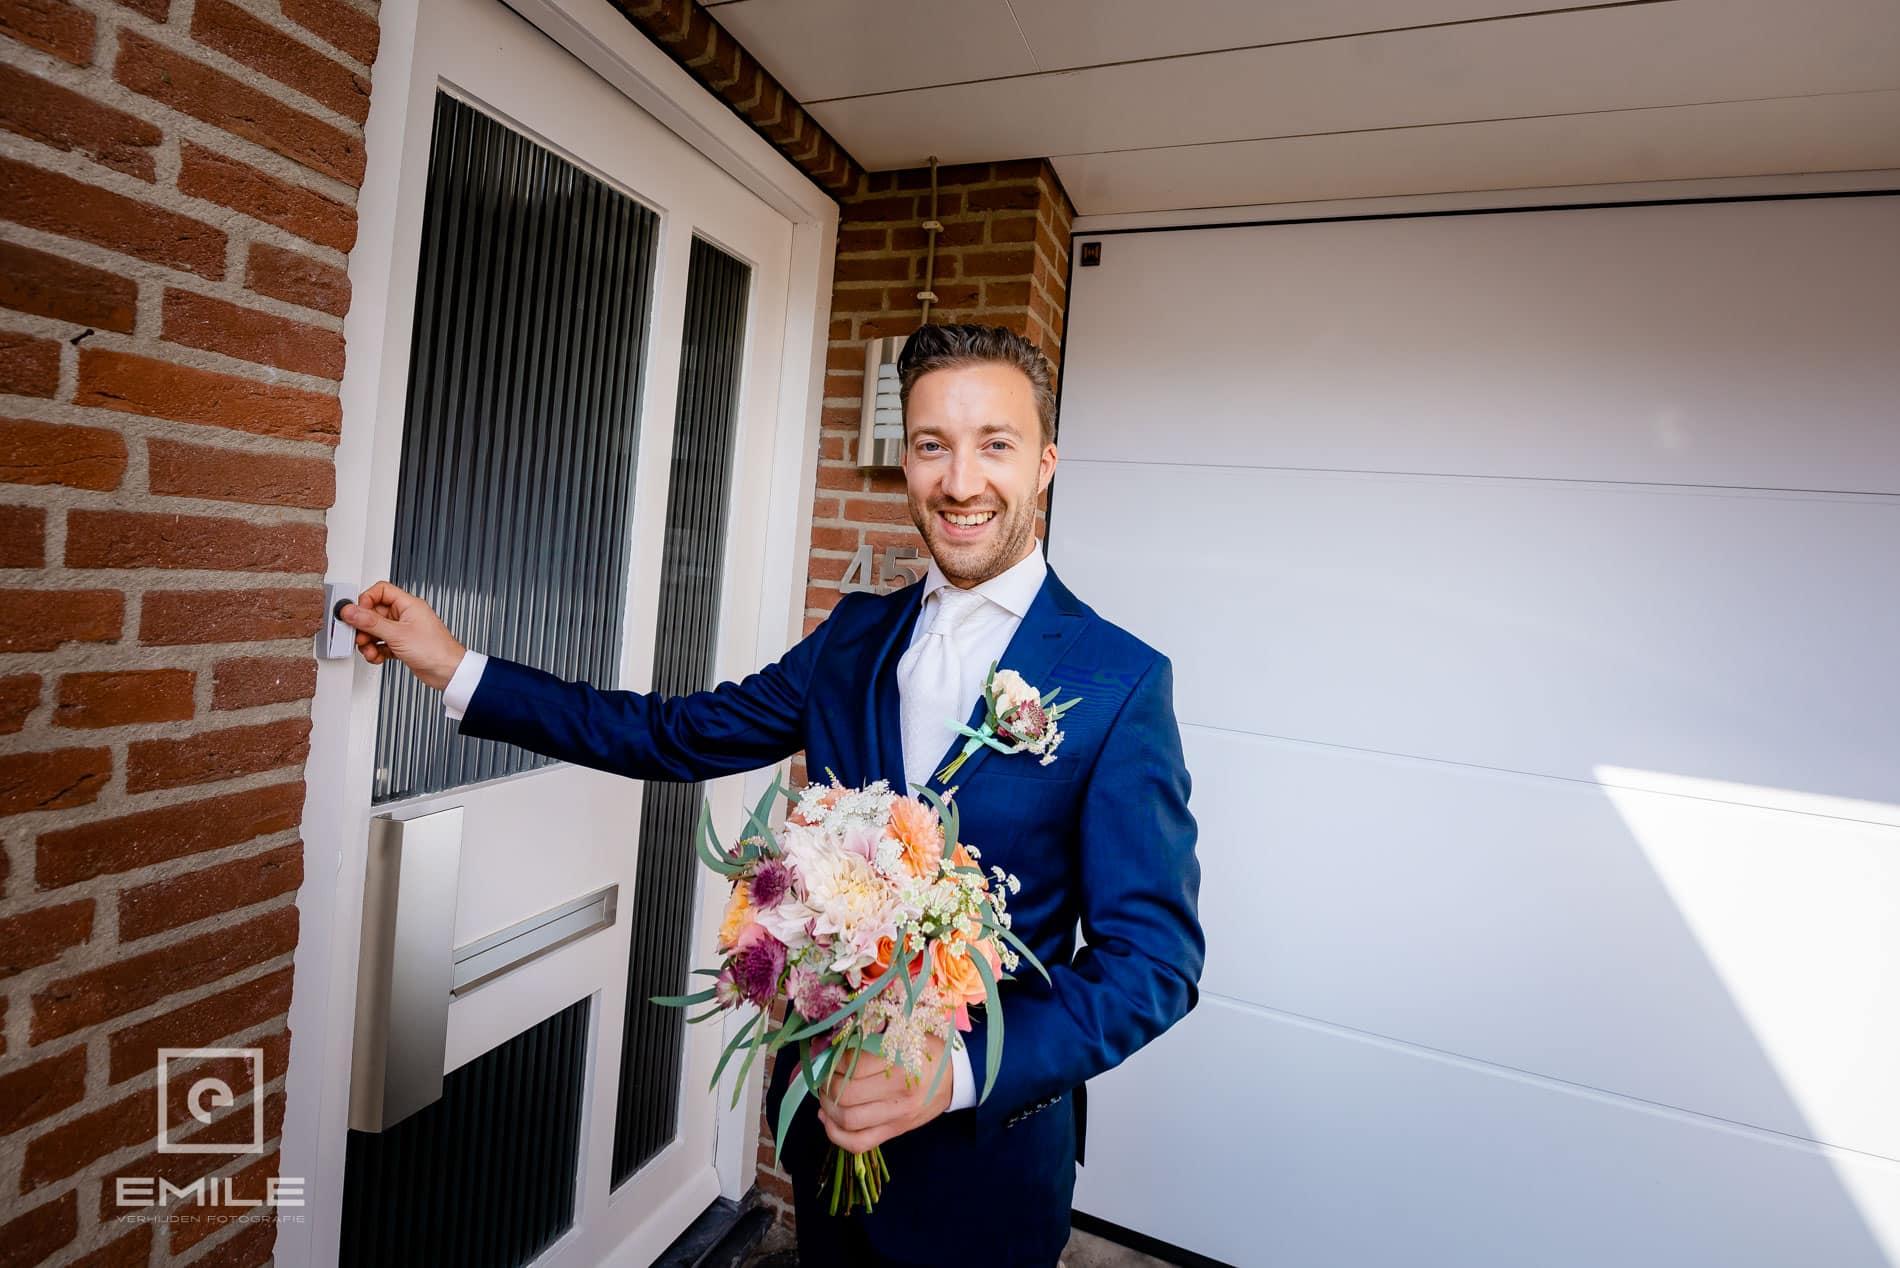 Bruidegom belt aan. trouwen in zuid-limburg